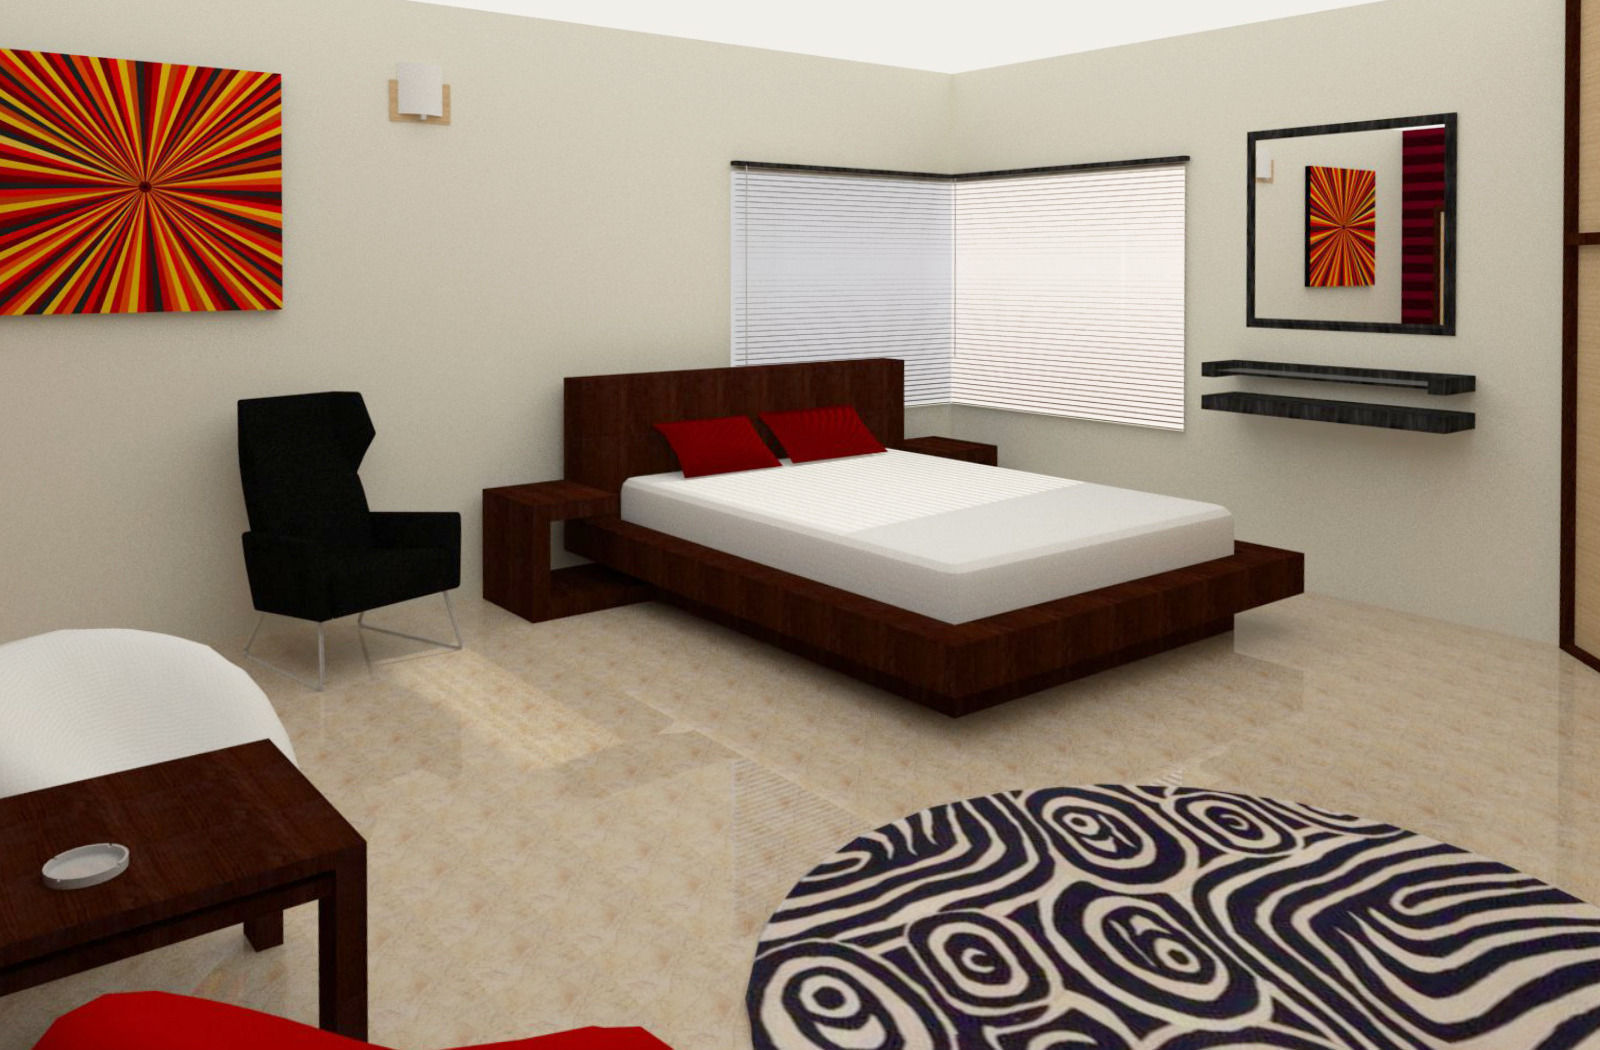 Simple Room Interior 3d Model Skp